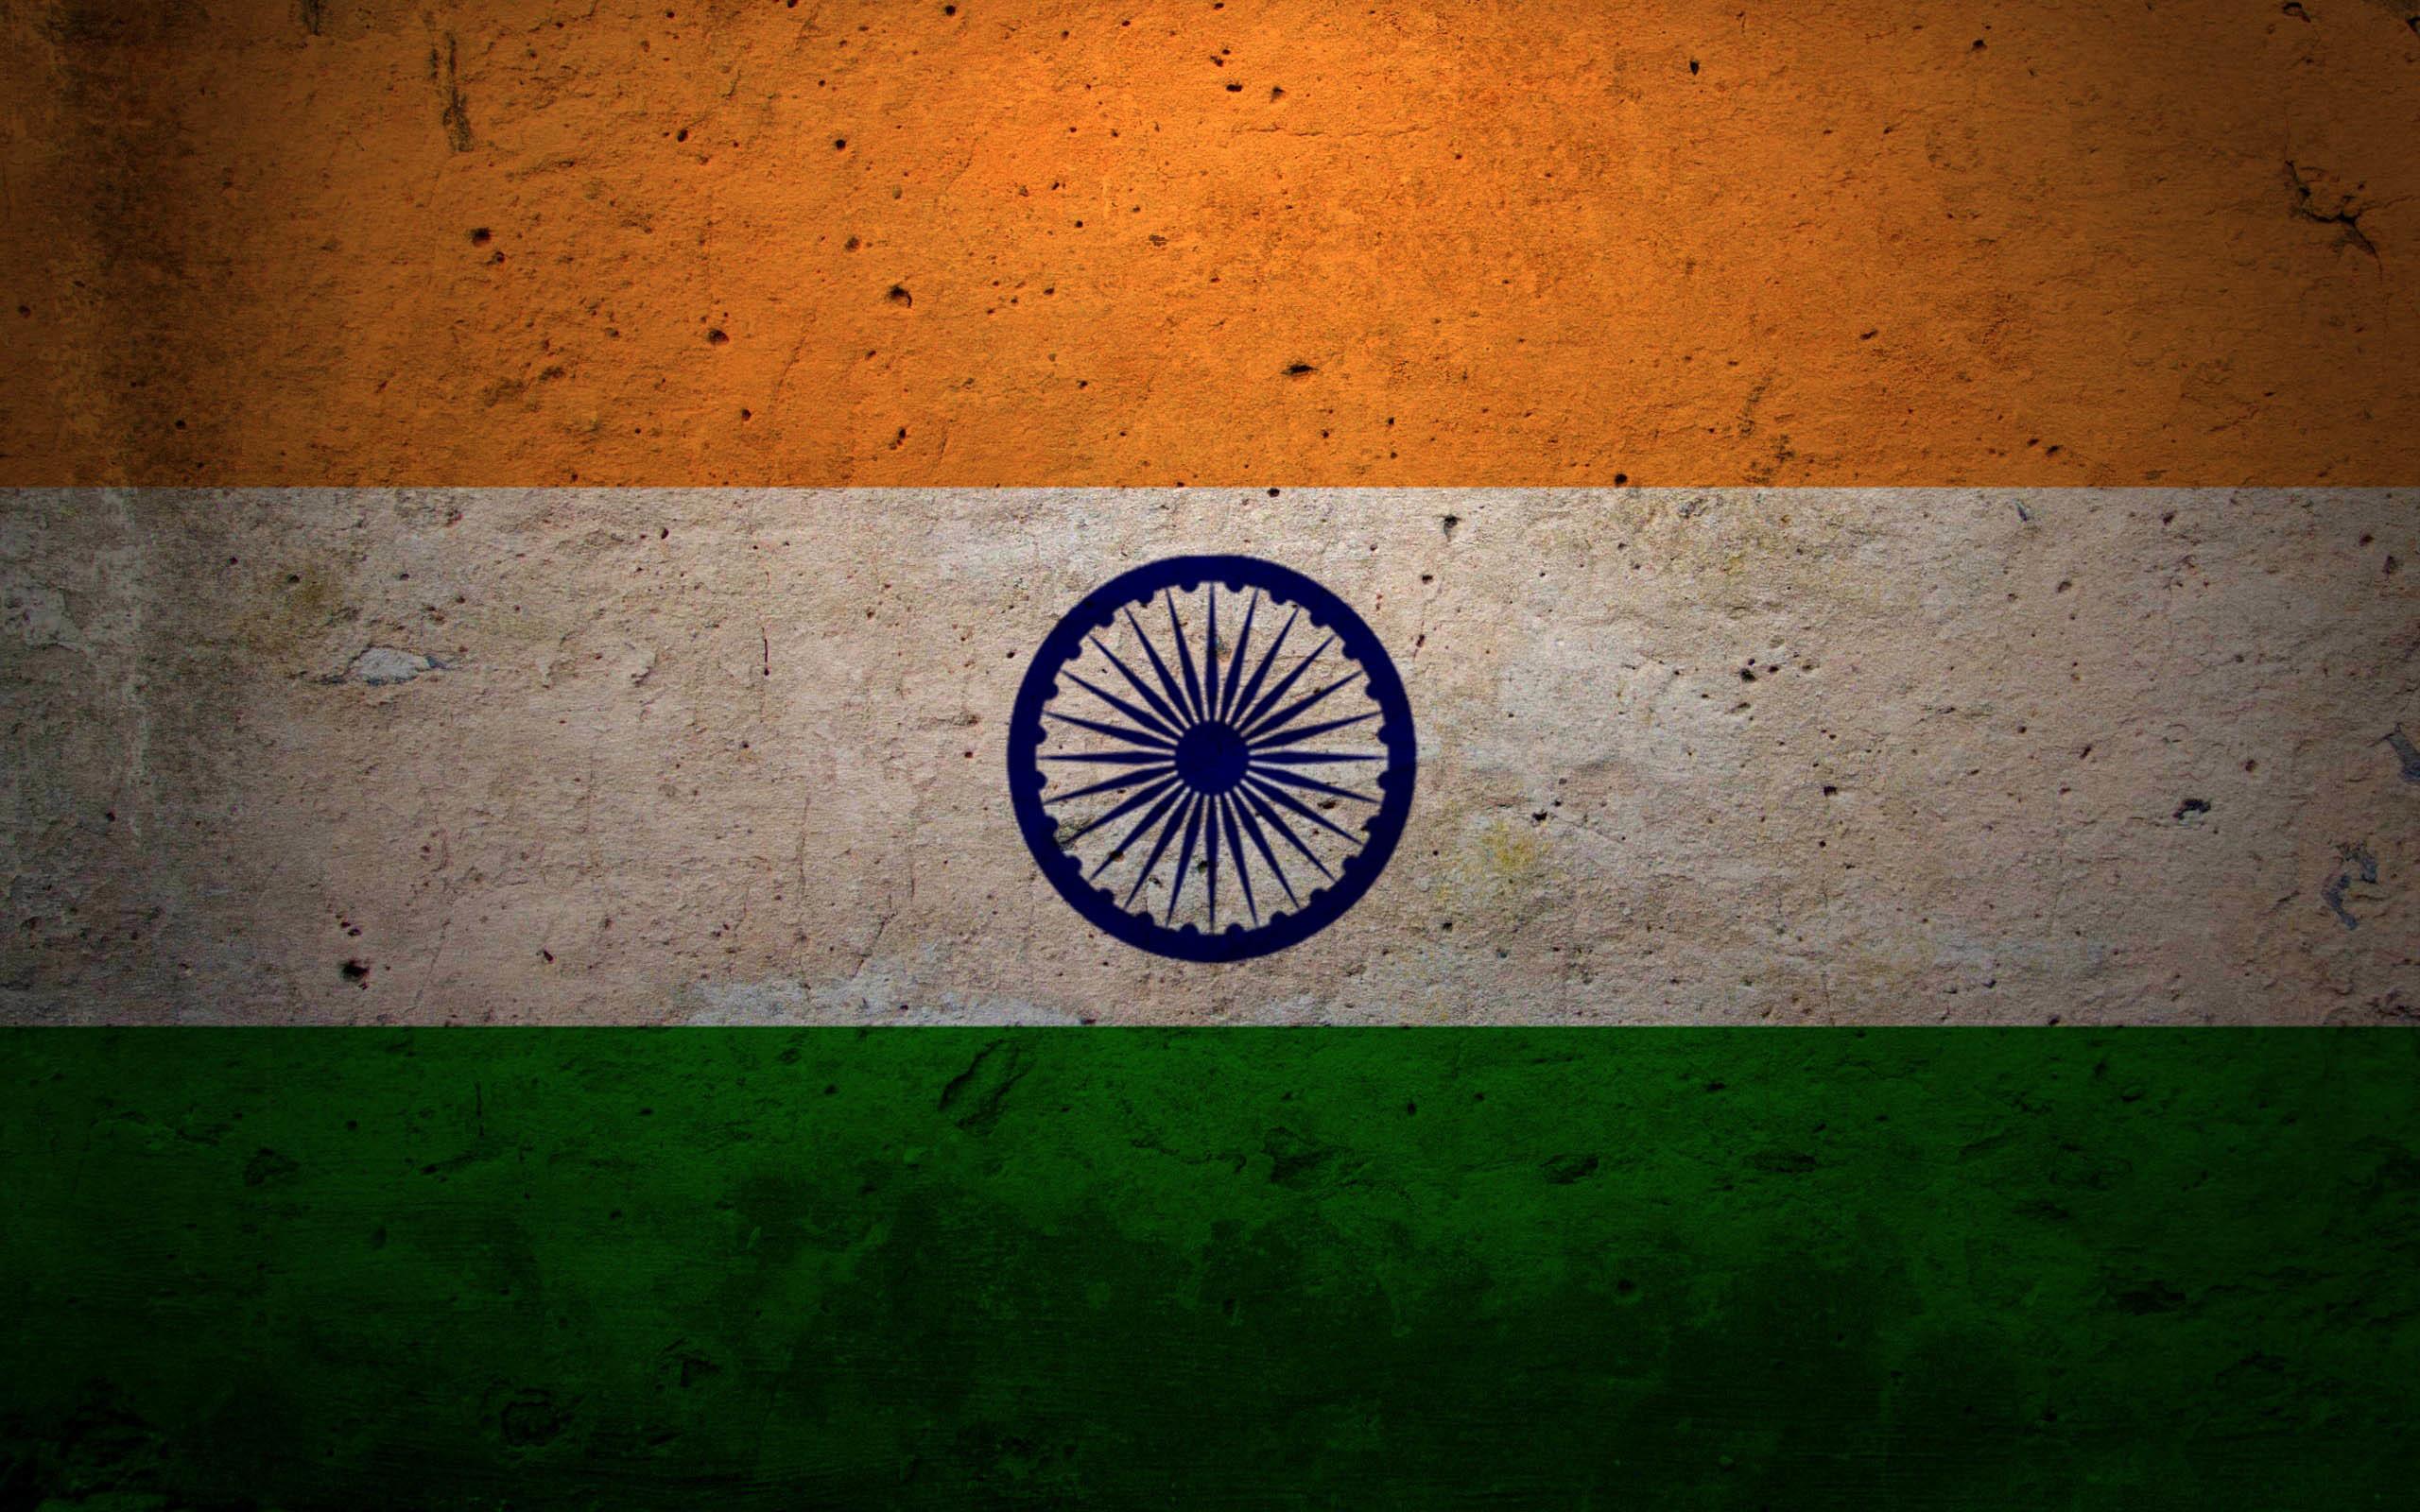 indian-flag-wallpaper-high-resolution-2 high resolution HD free .